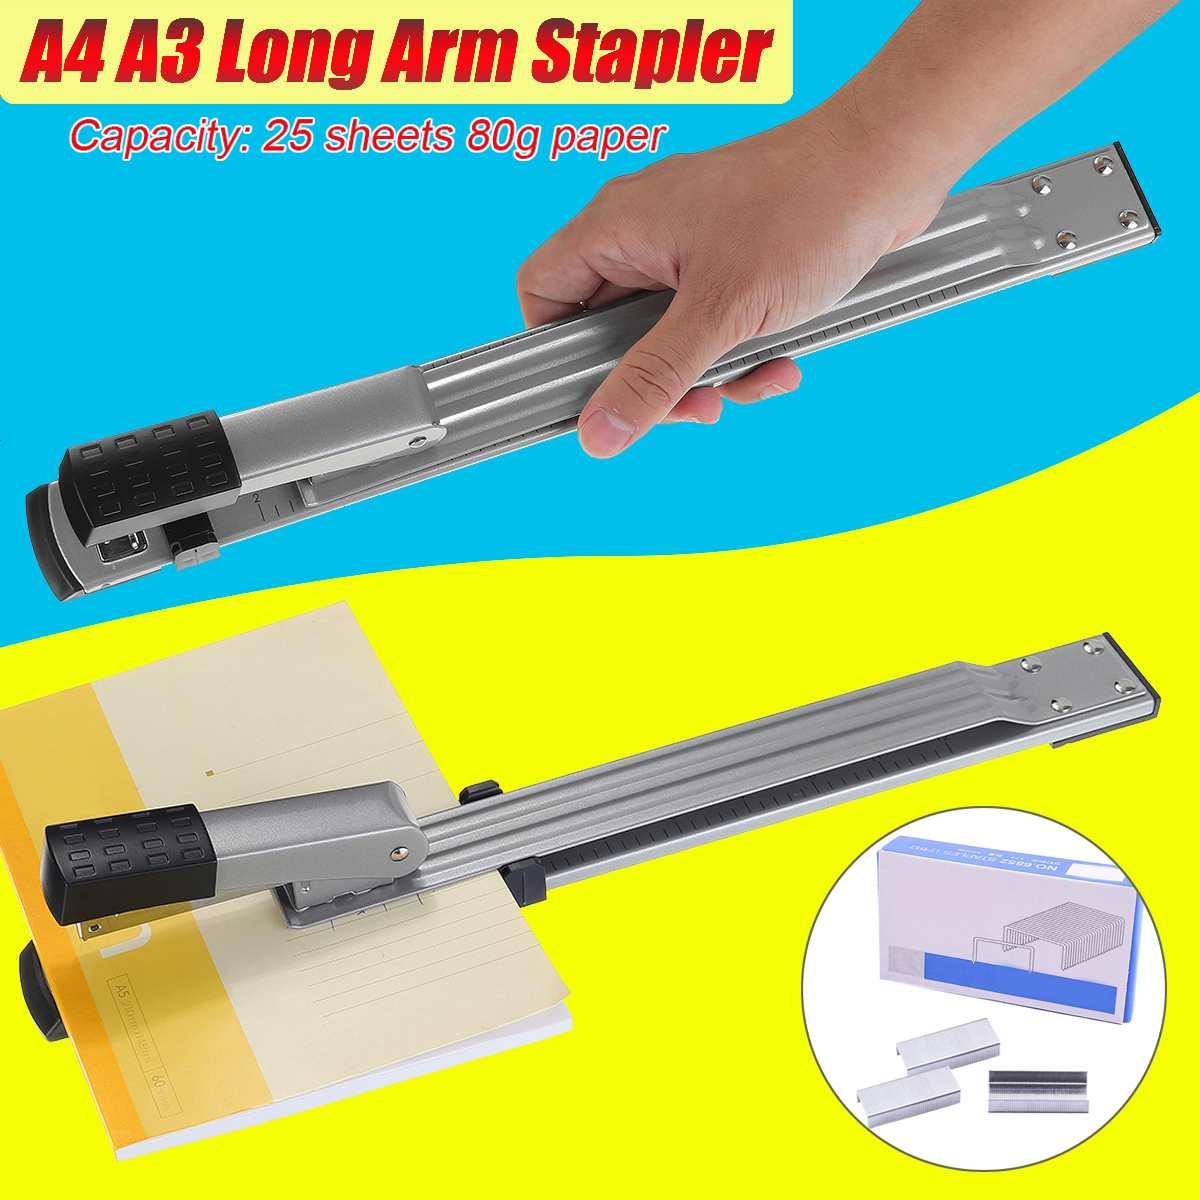 Steel Long Arm Stapler Metal Special A4 A3 Sewing Machine Staple Lengthening Stapler Paper Stapling Office Stapler Bookbinding